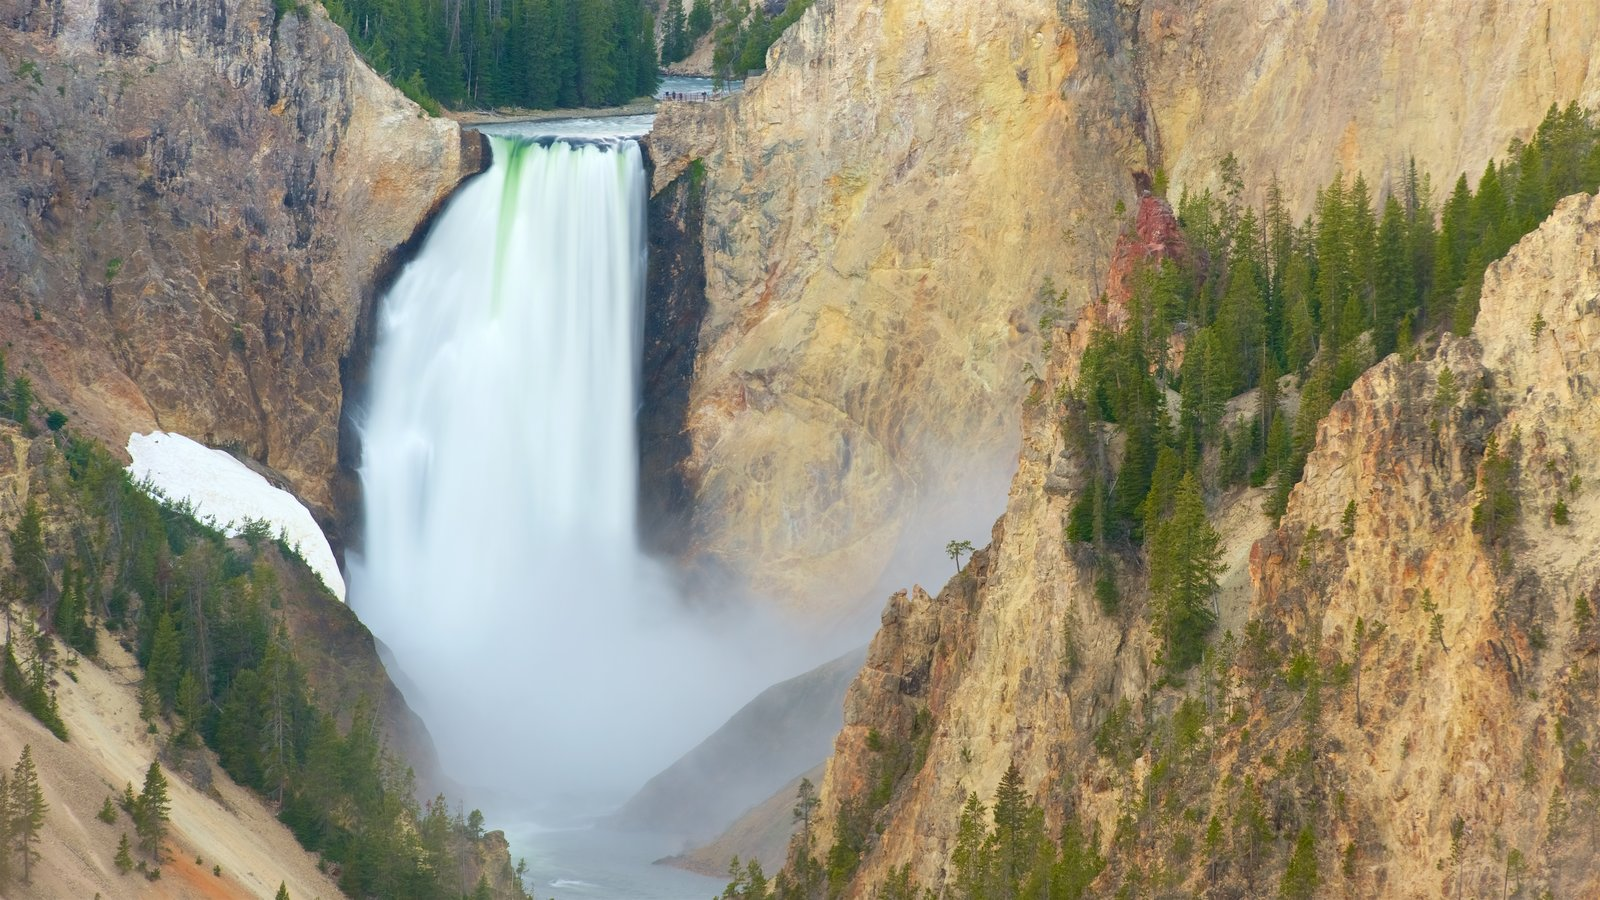 Grand Canyon of Yellowstone que inclui uma cachoeira